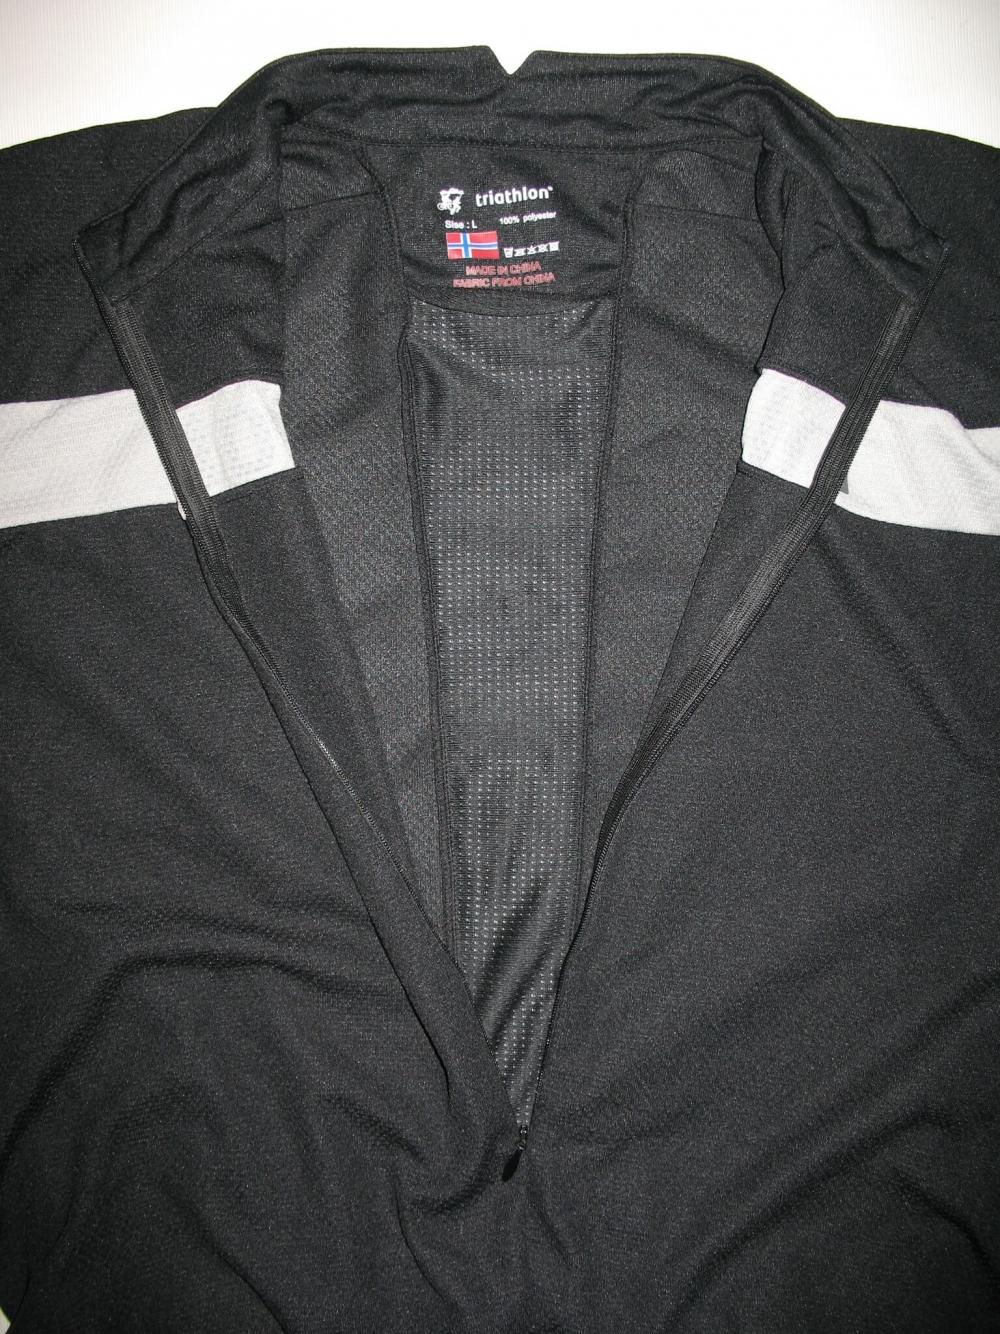 Веломайка TRIATHLON jersey (размер L) - 2